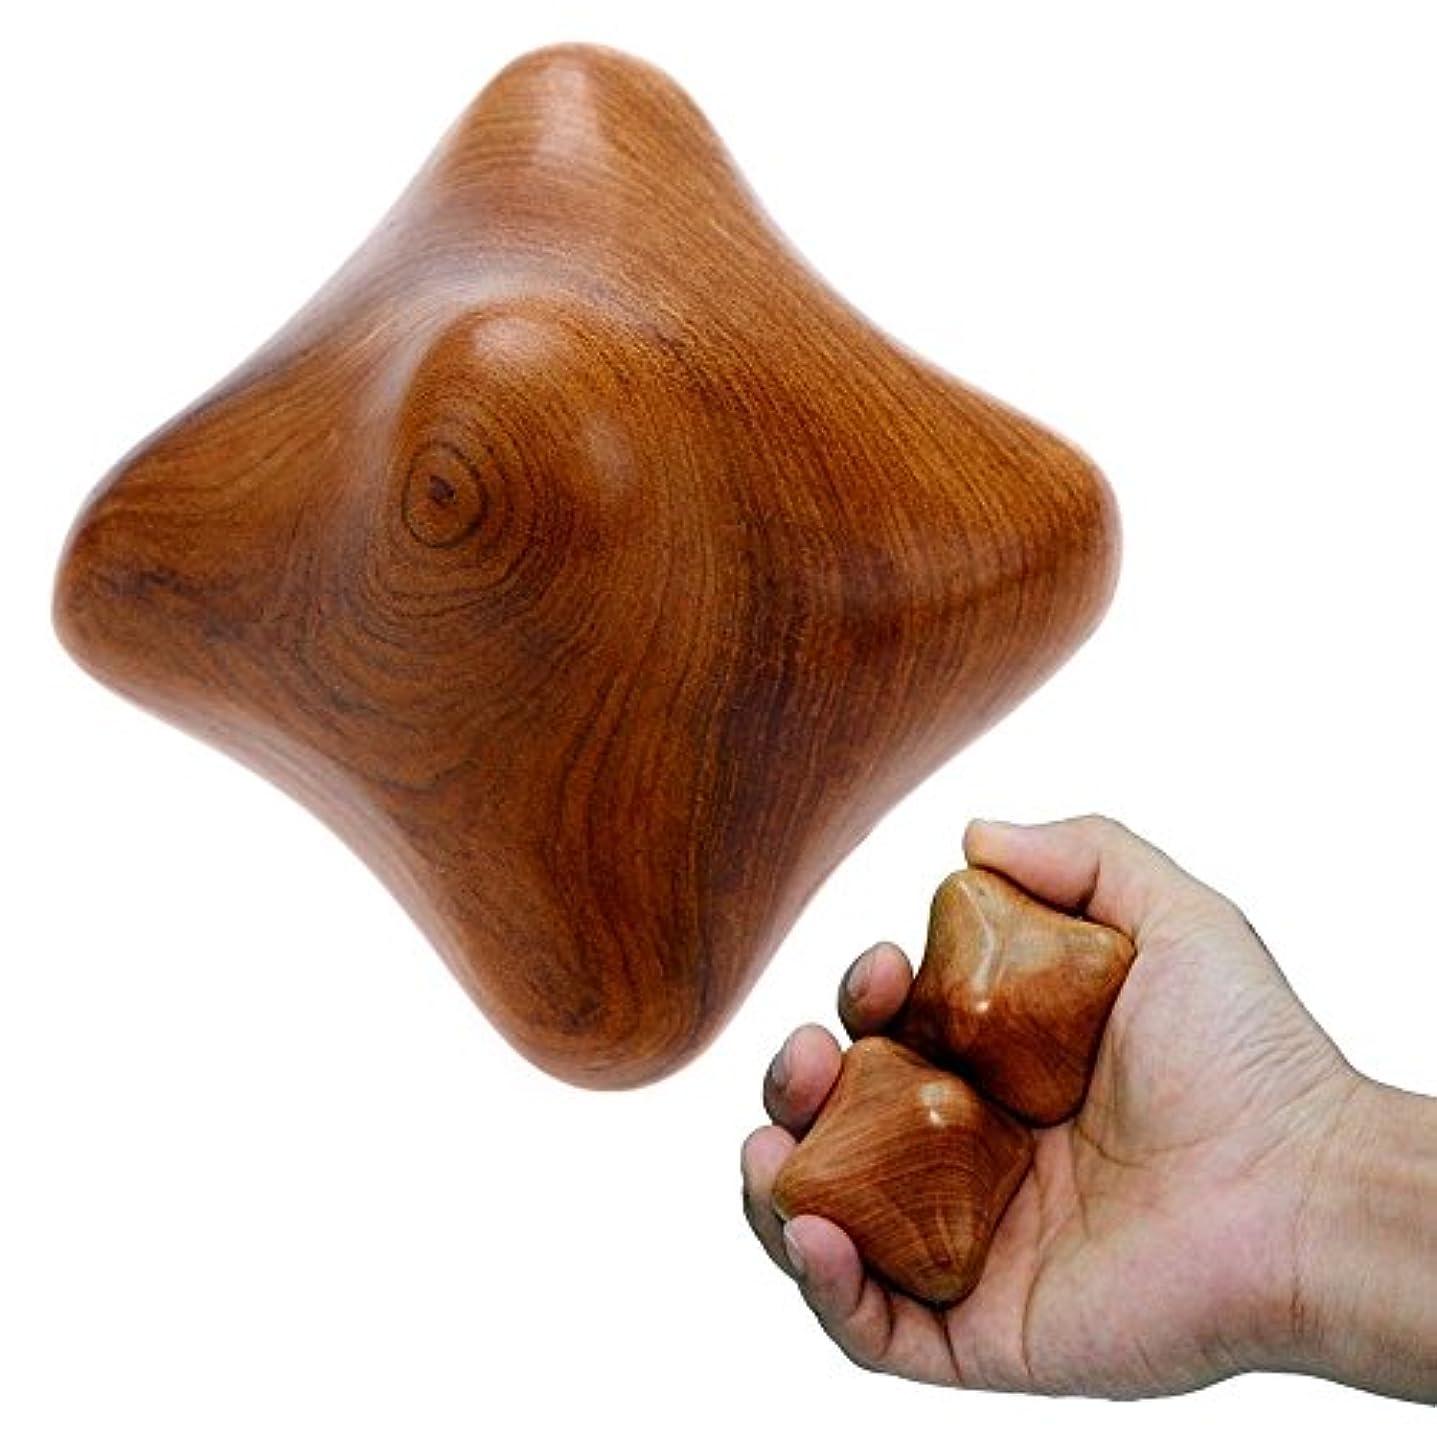 MARUKOA - 2 SET Thai Traditional Reflexology Massage Therapy Fingers Hand Wood Star